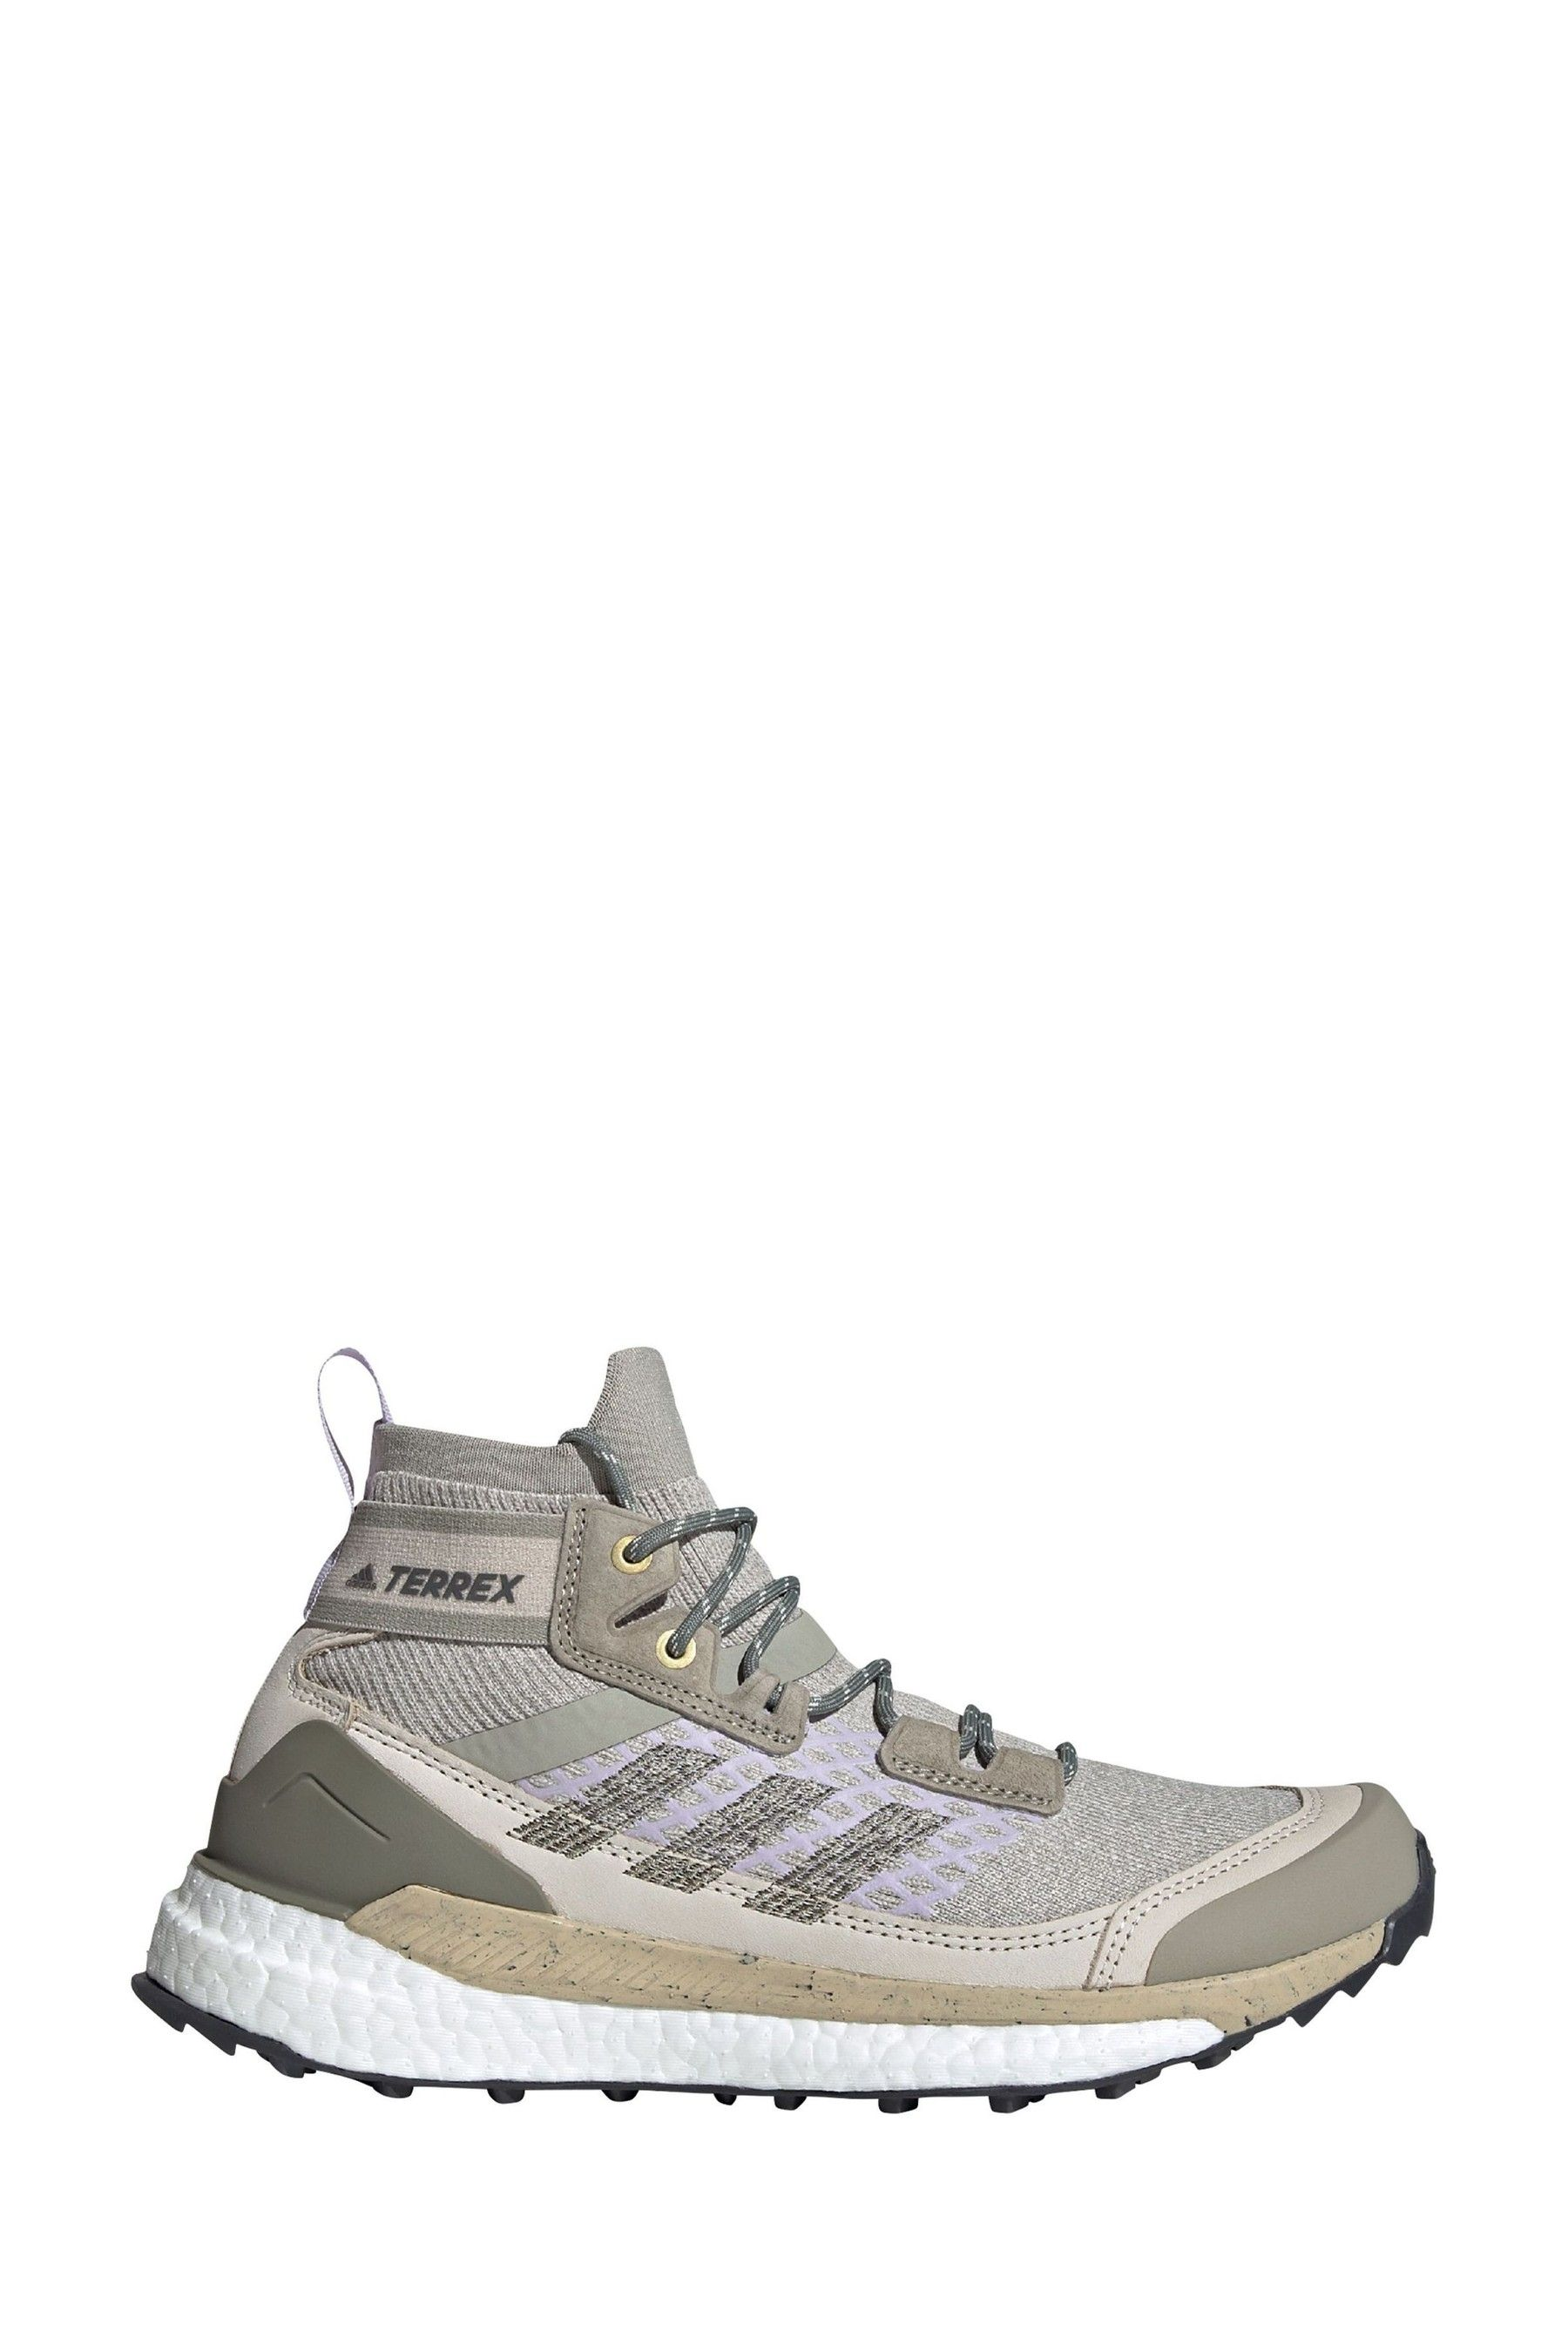 adidas Terrex Free Hiker Boots in 2020 | Adidas women, Boots